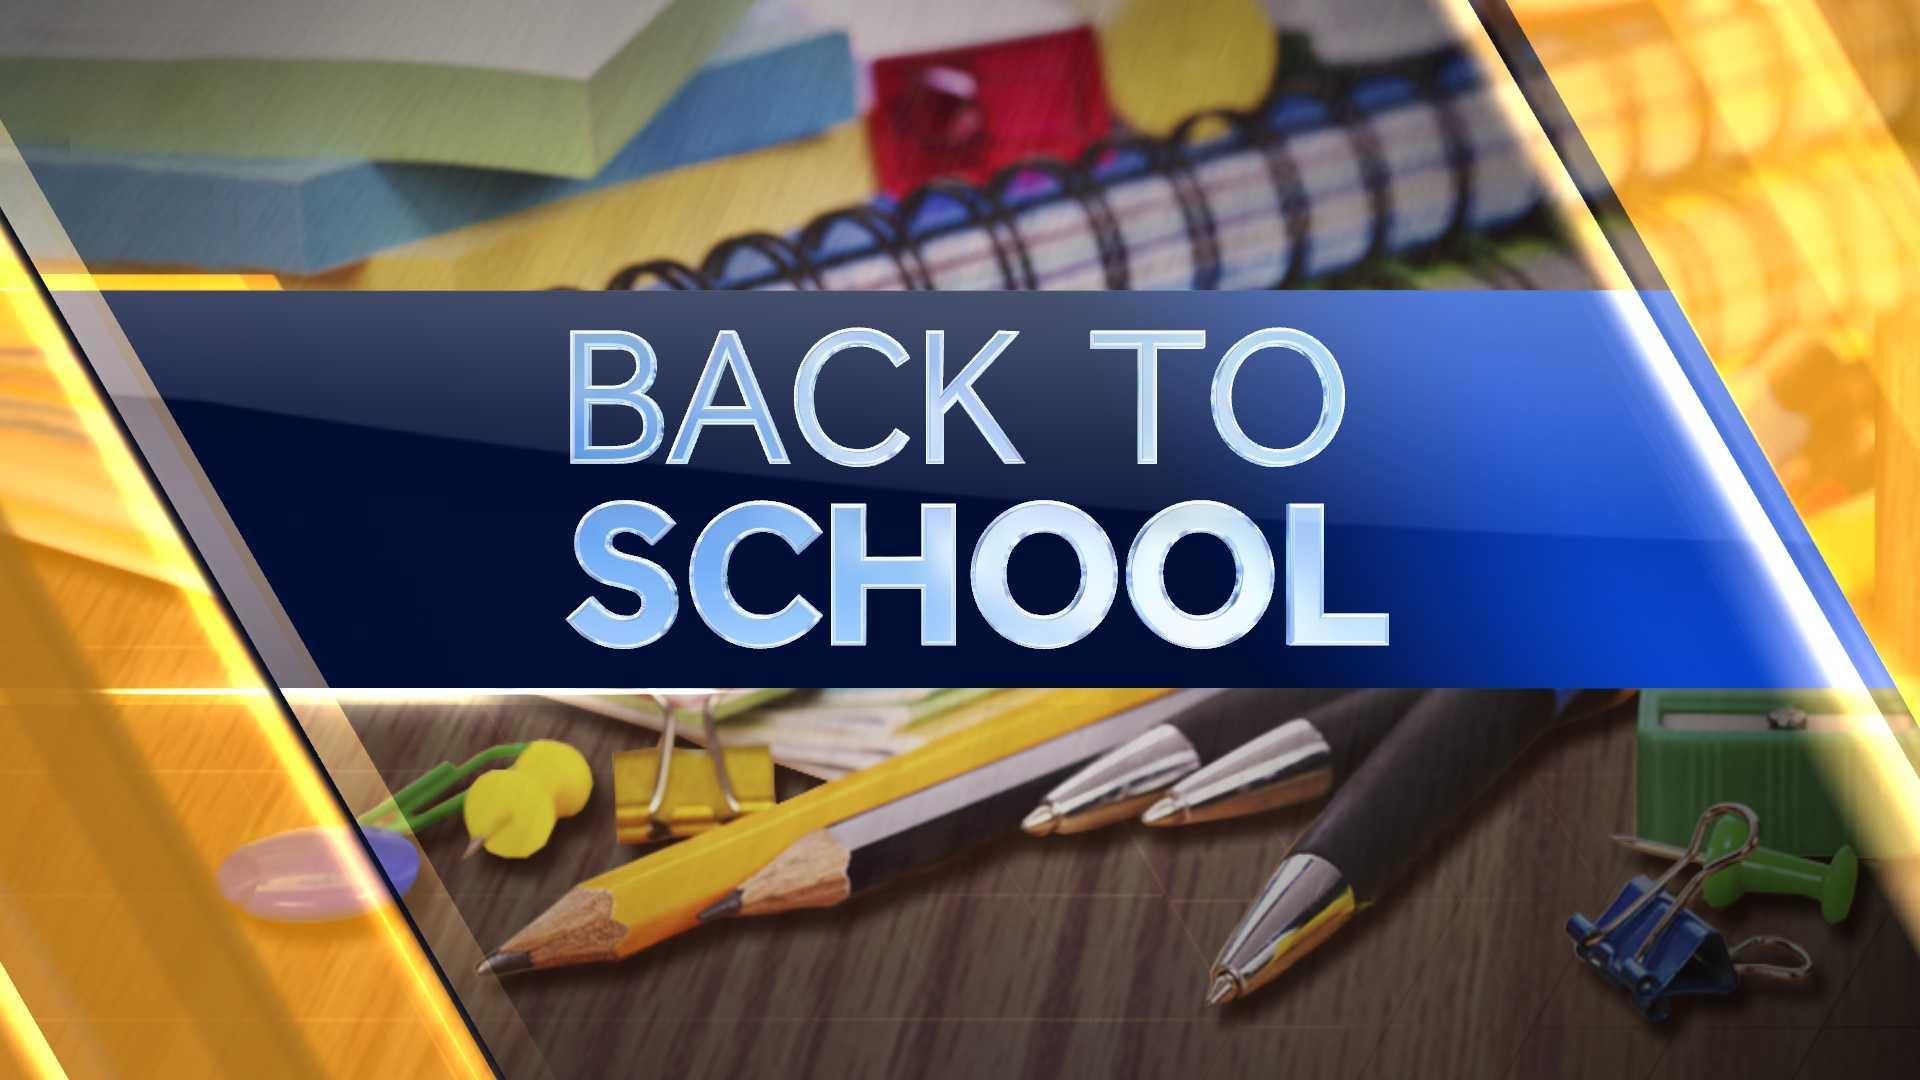 _BACK TO SCHOOL PROMO_0000.jpg